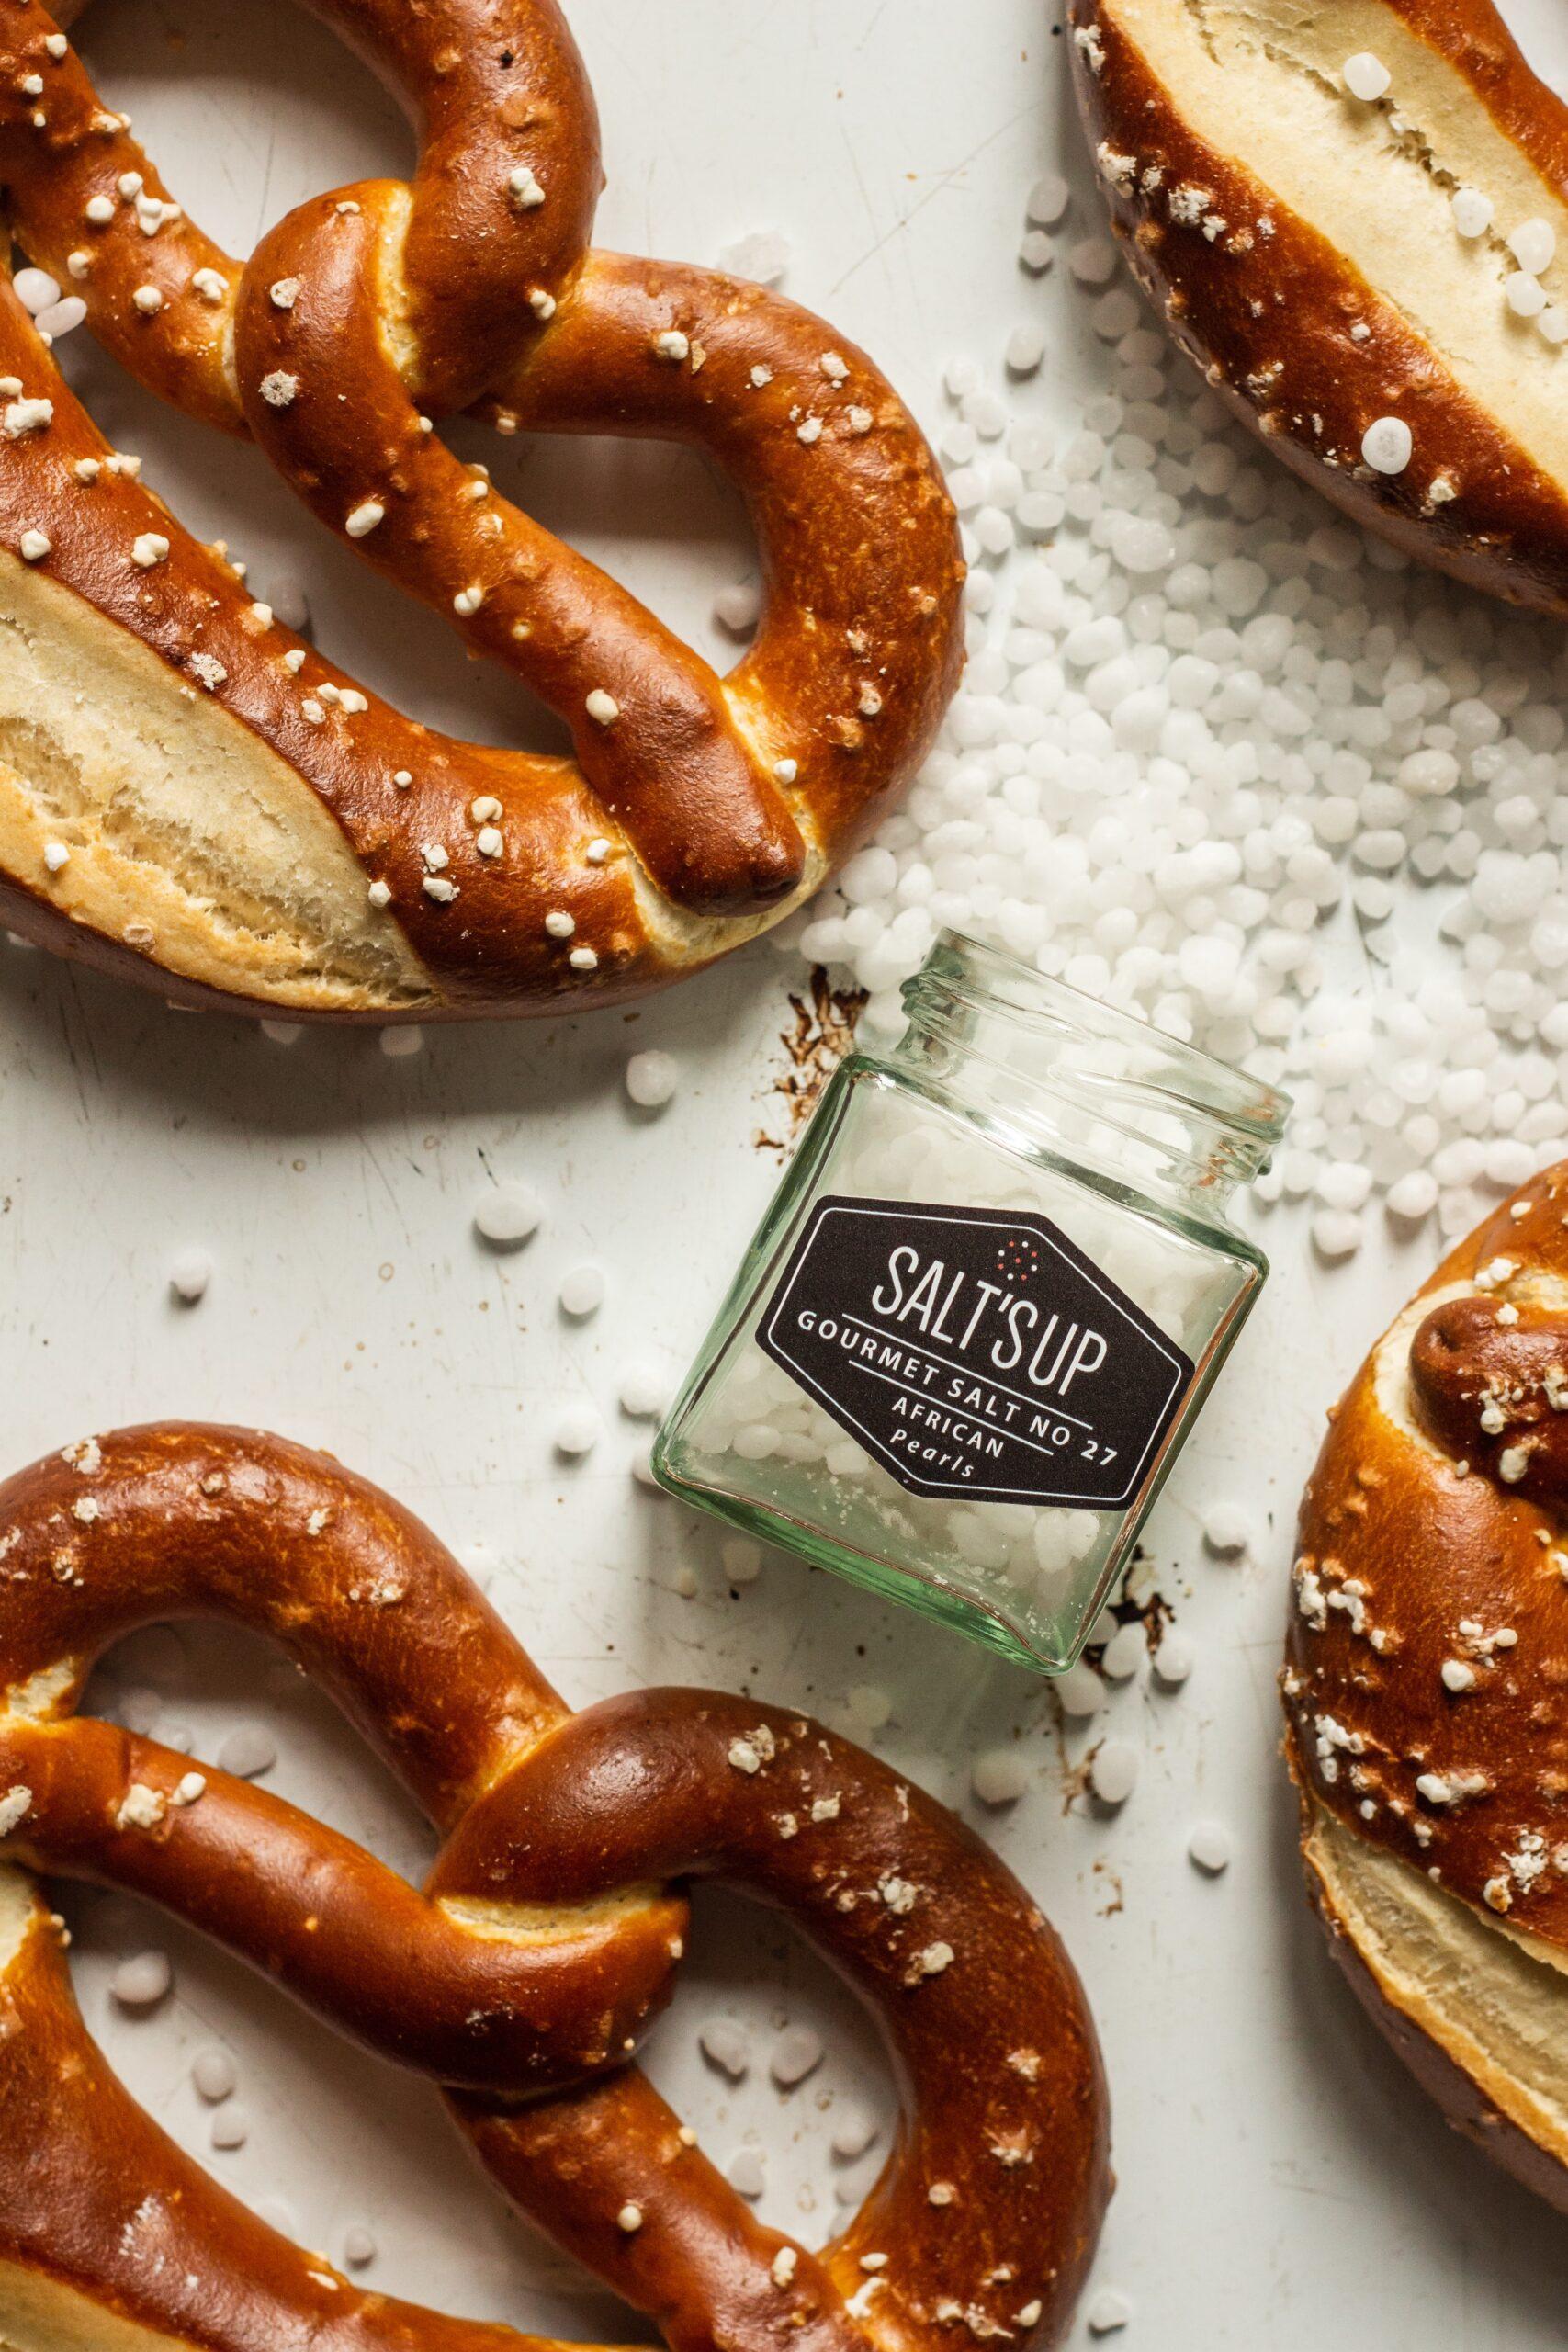 Eat2Gather w-EET-je waarom zout morsen ongeluk brengt?